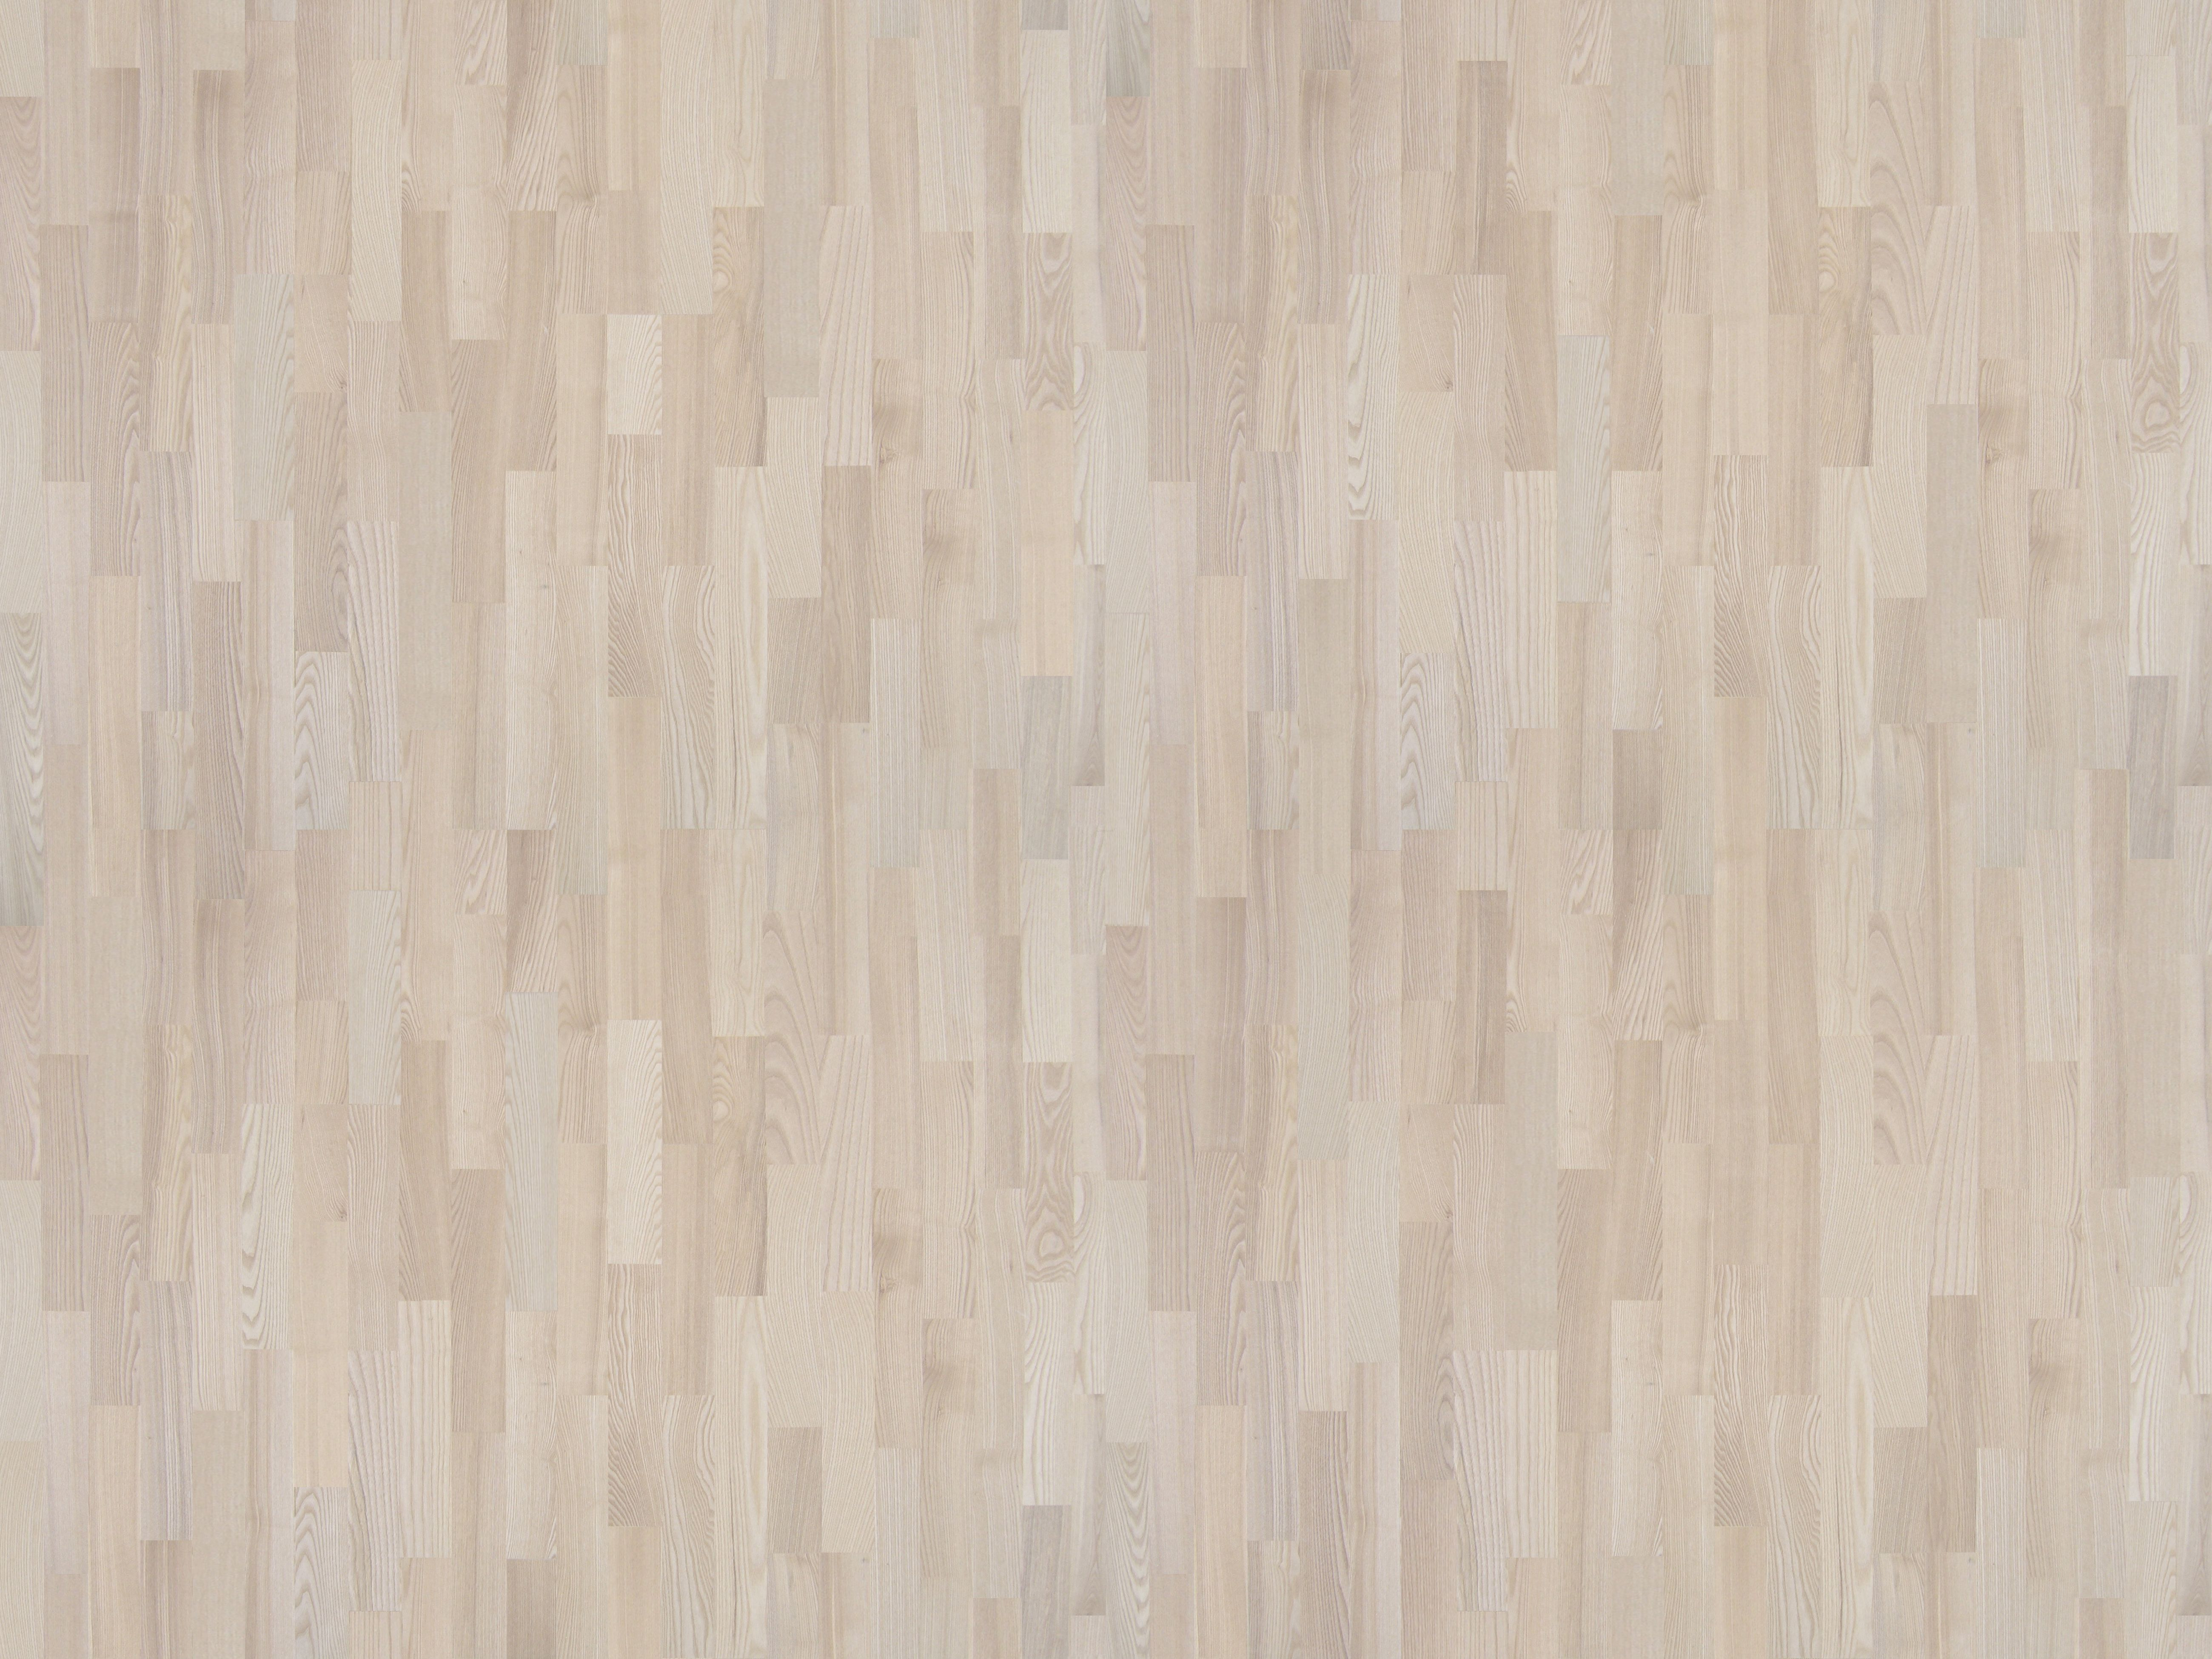 Light Wood Floor Texture Seamless Design Inspiration 210055 Ideas